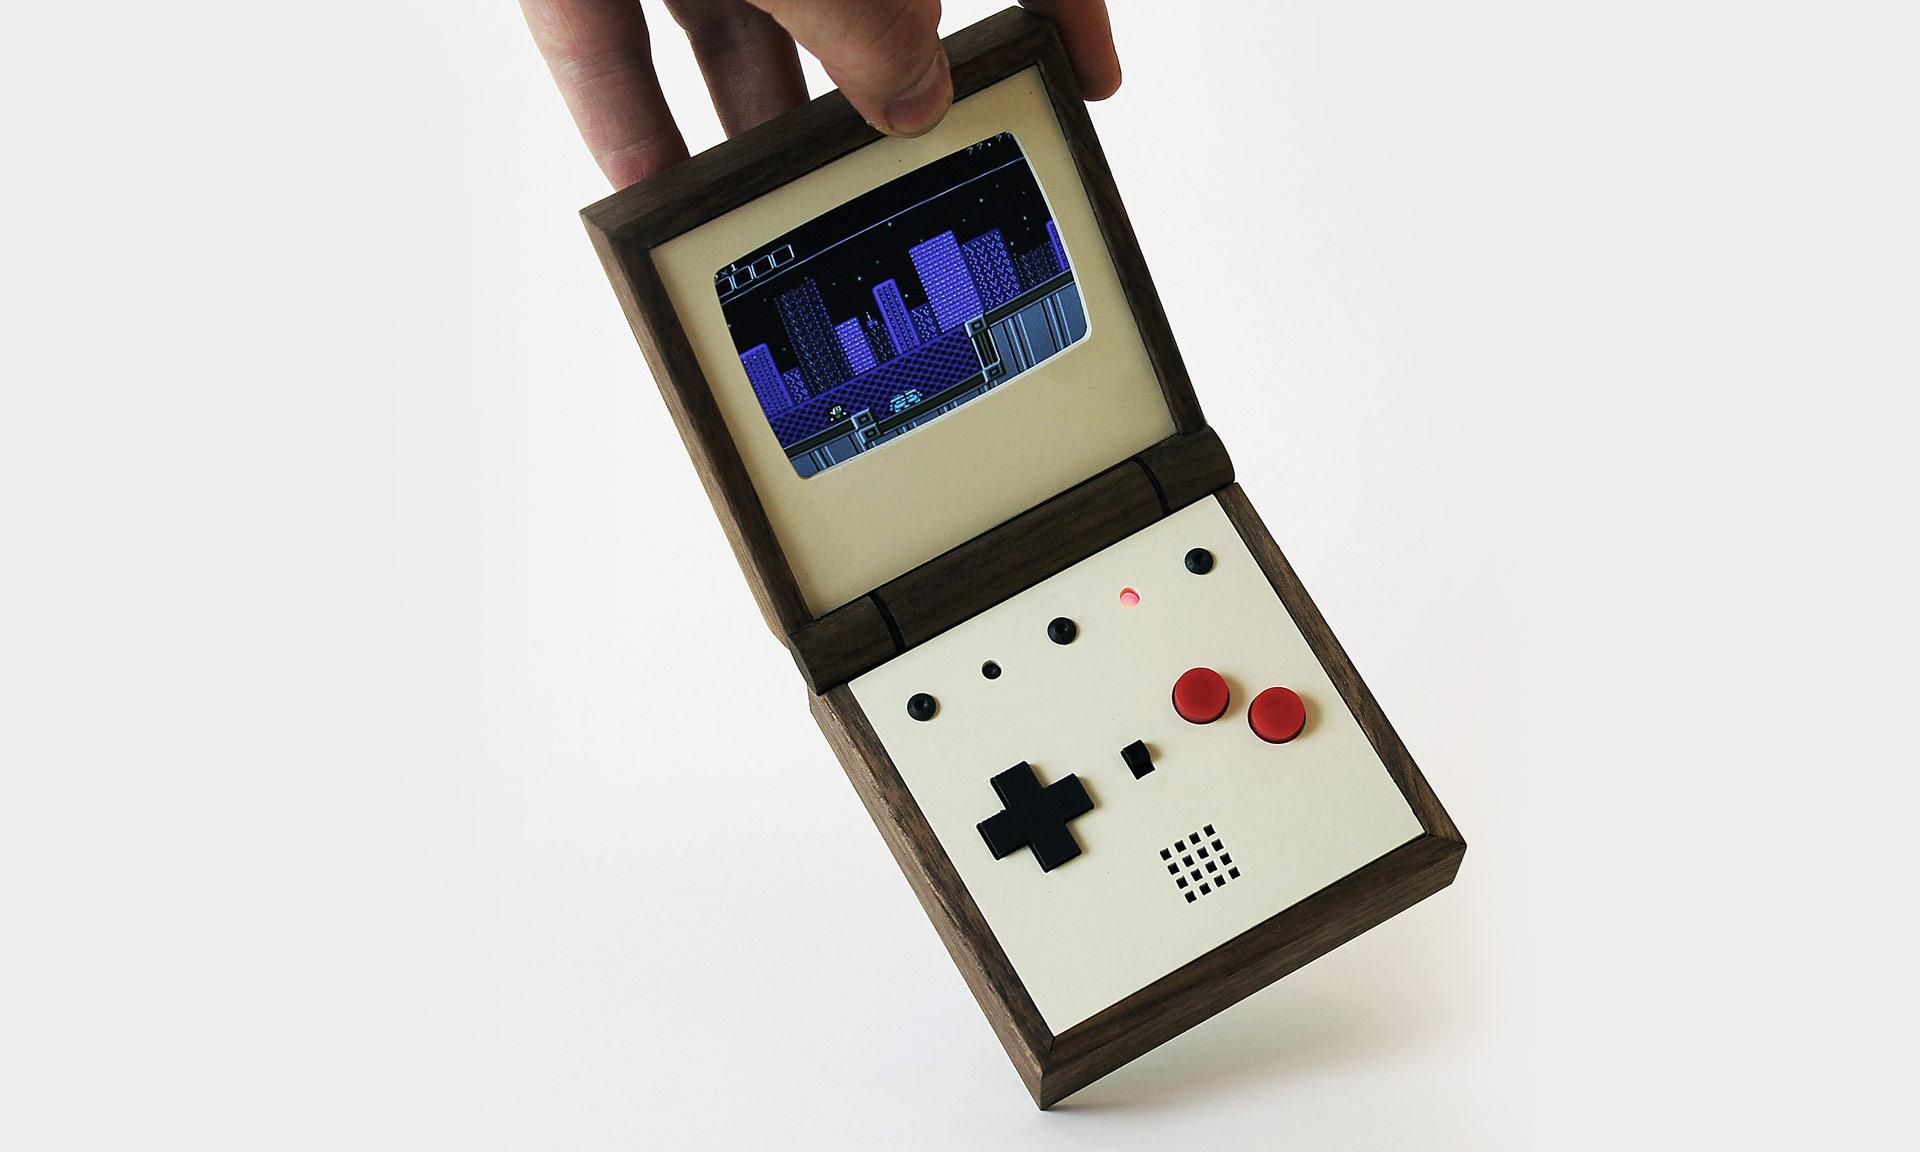 console-portable-bois-love-hulten-cdc-home